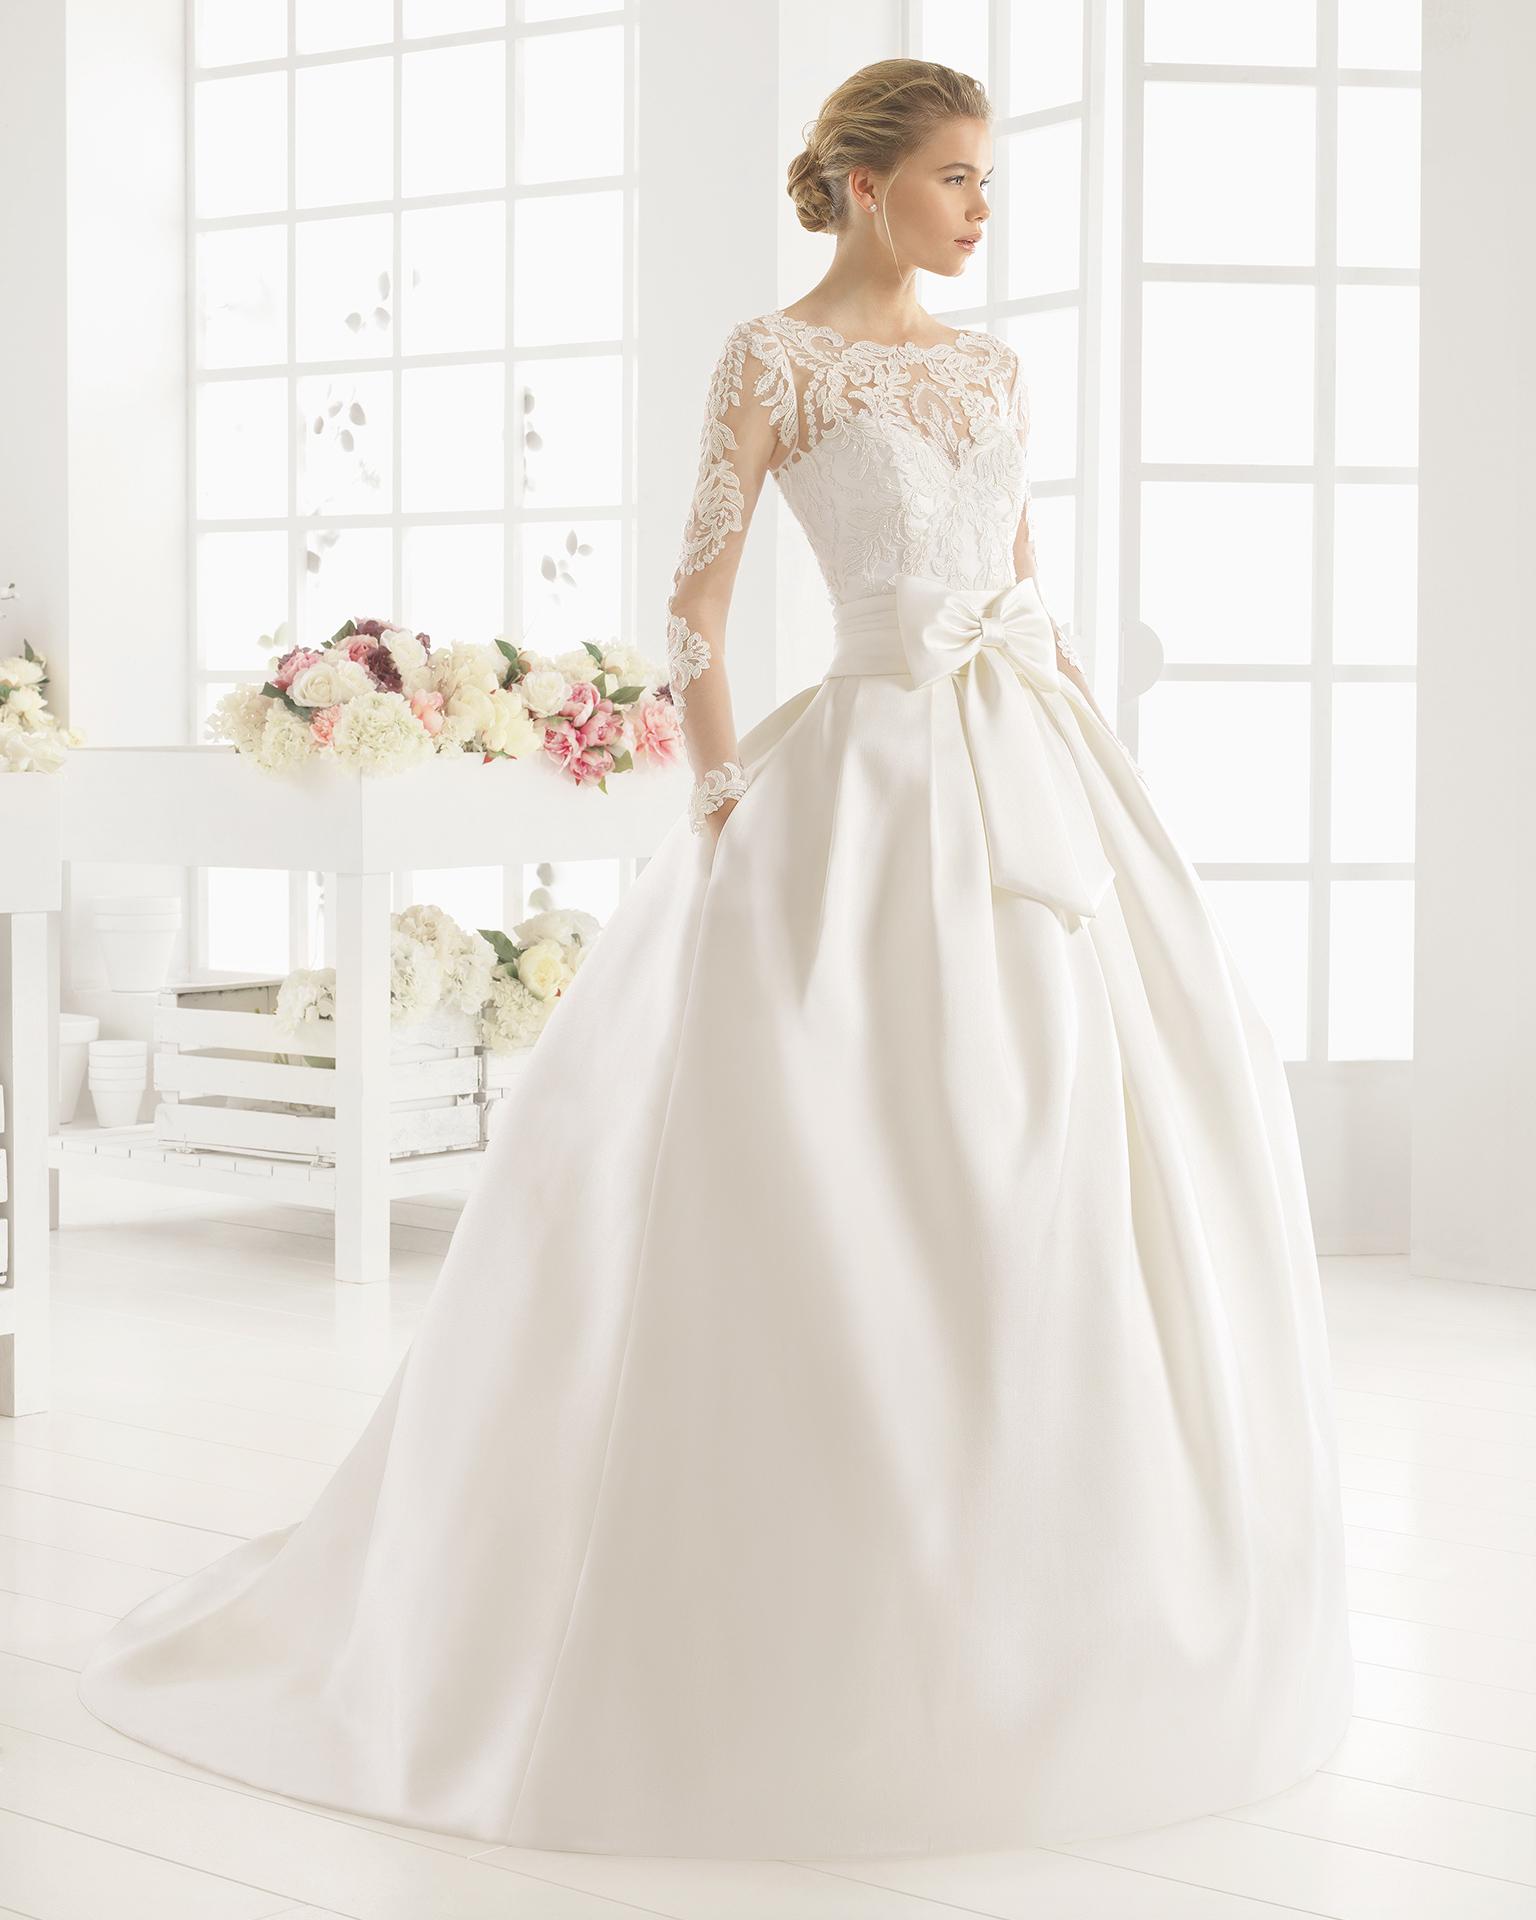 MIDAS wedding dress - Aire Barcelona 2016.